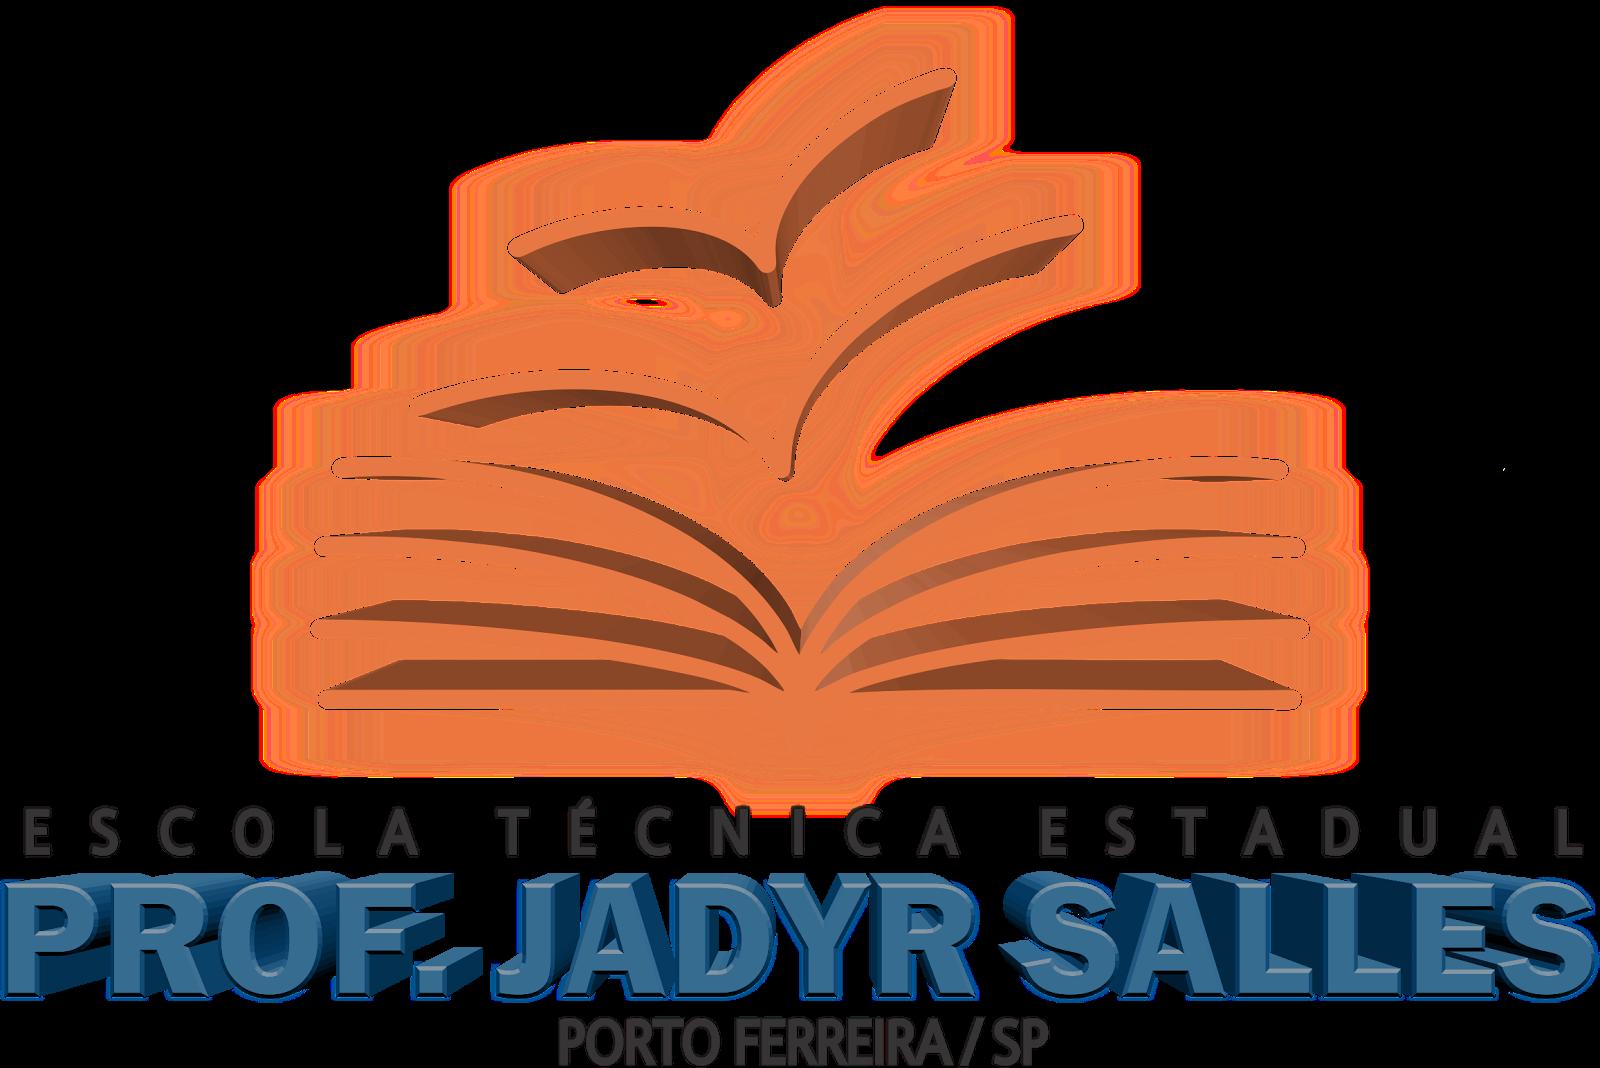 ETEC Prof. Jadyrs Salles